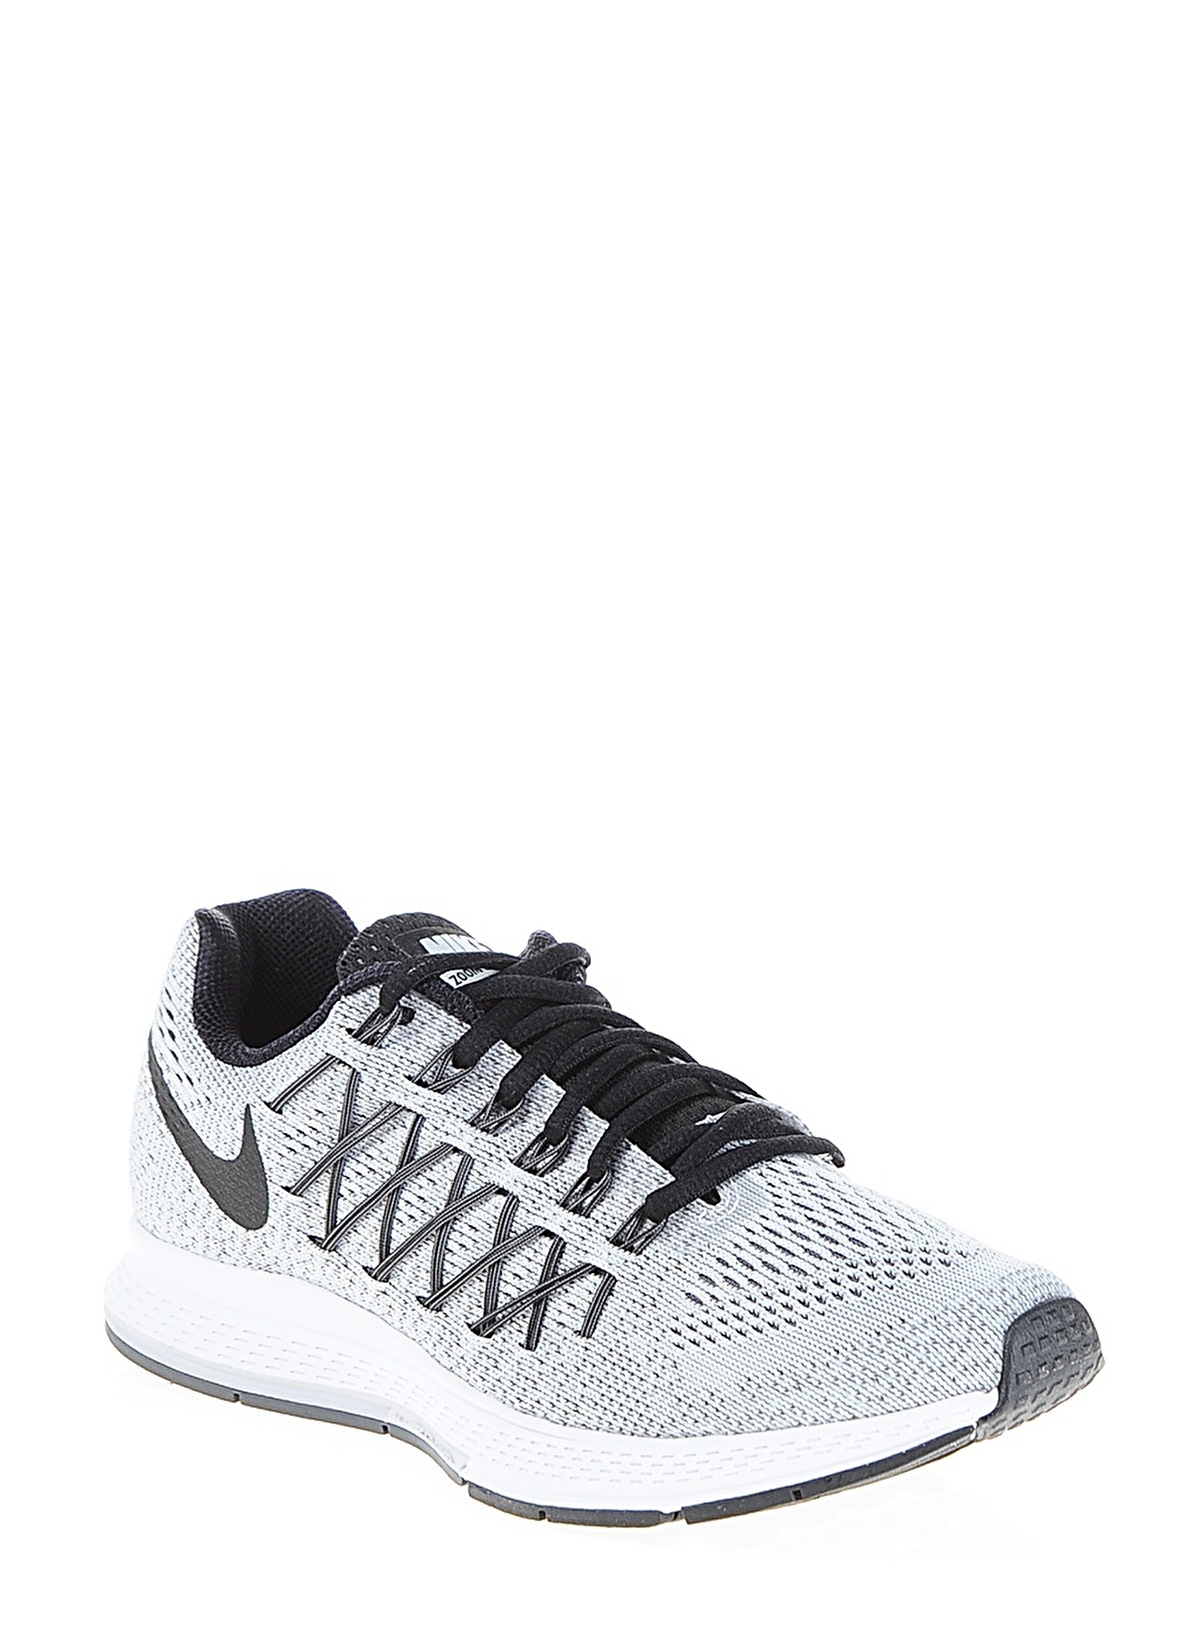 95e36fe083a86 Nike Kadın Wmns Nike Air Zoom Peg Pure Platinum Black-Dark Grey ...